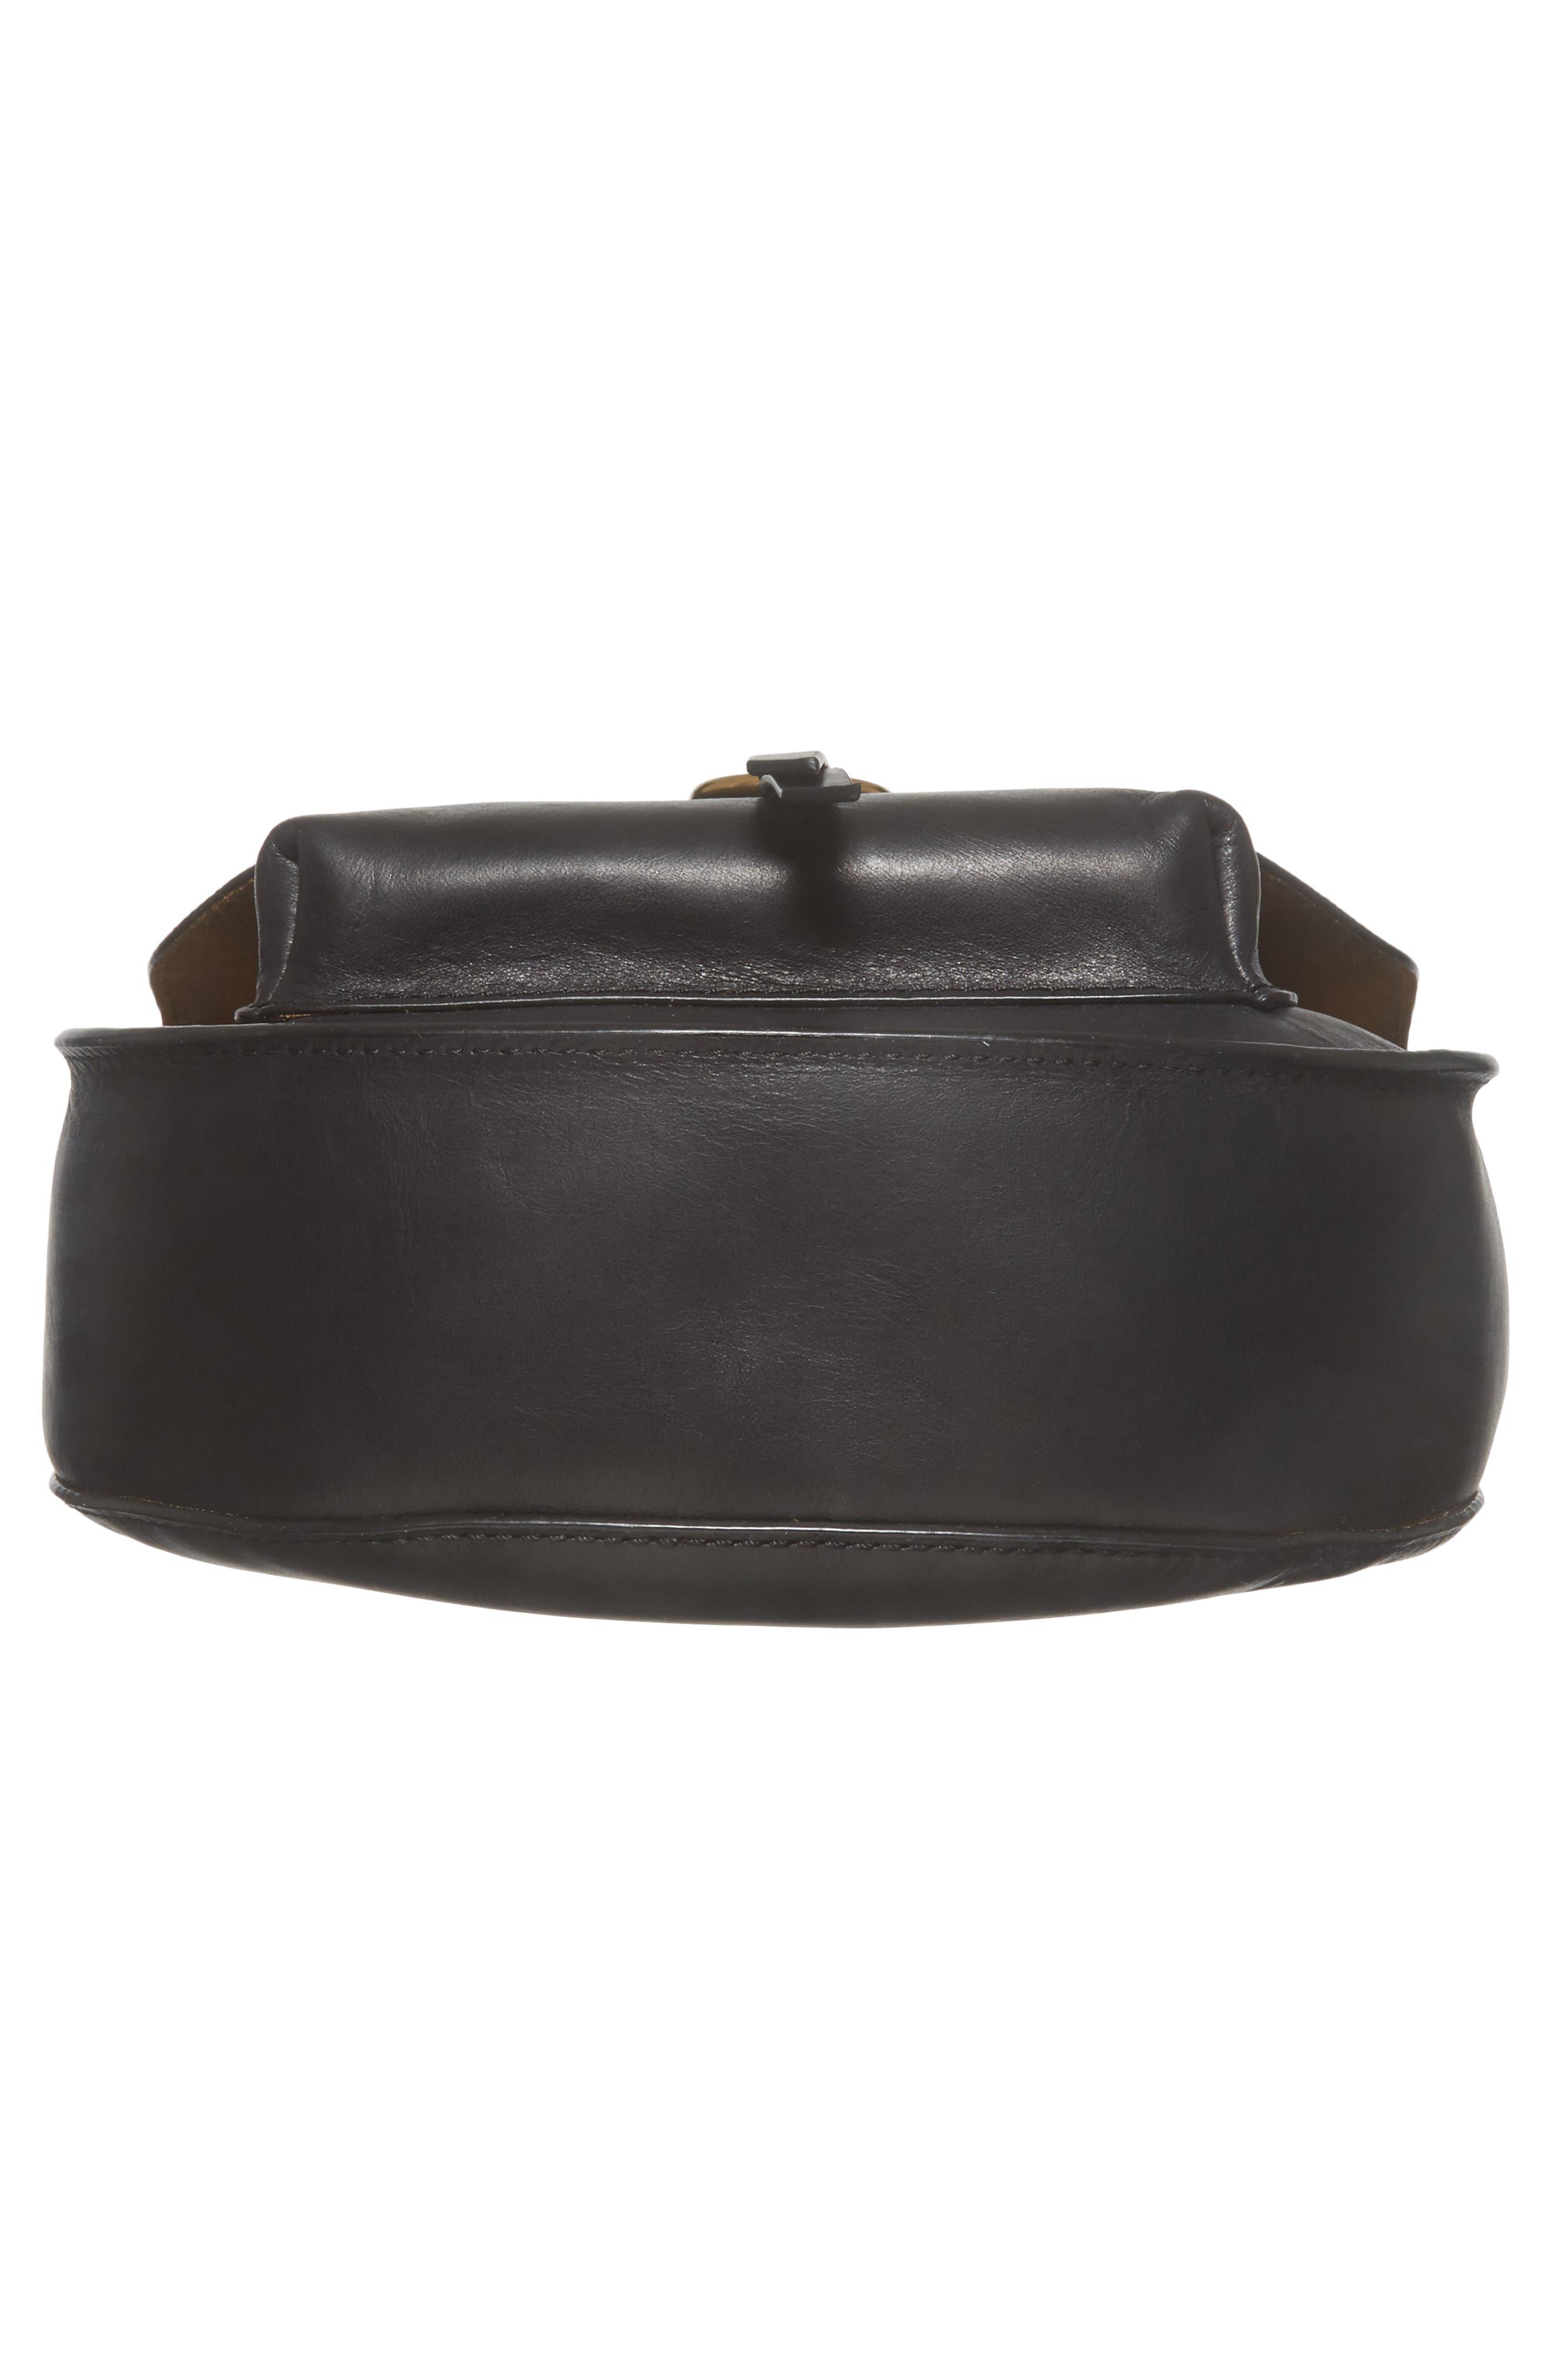 Ilana Leather Saddle Bag,                             Alternate thumbnail 6, color,                             001